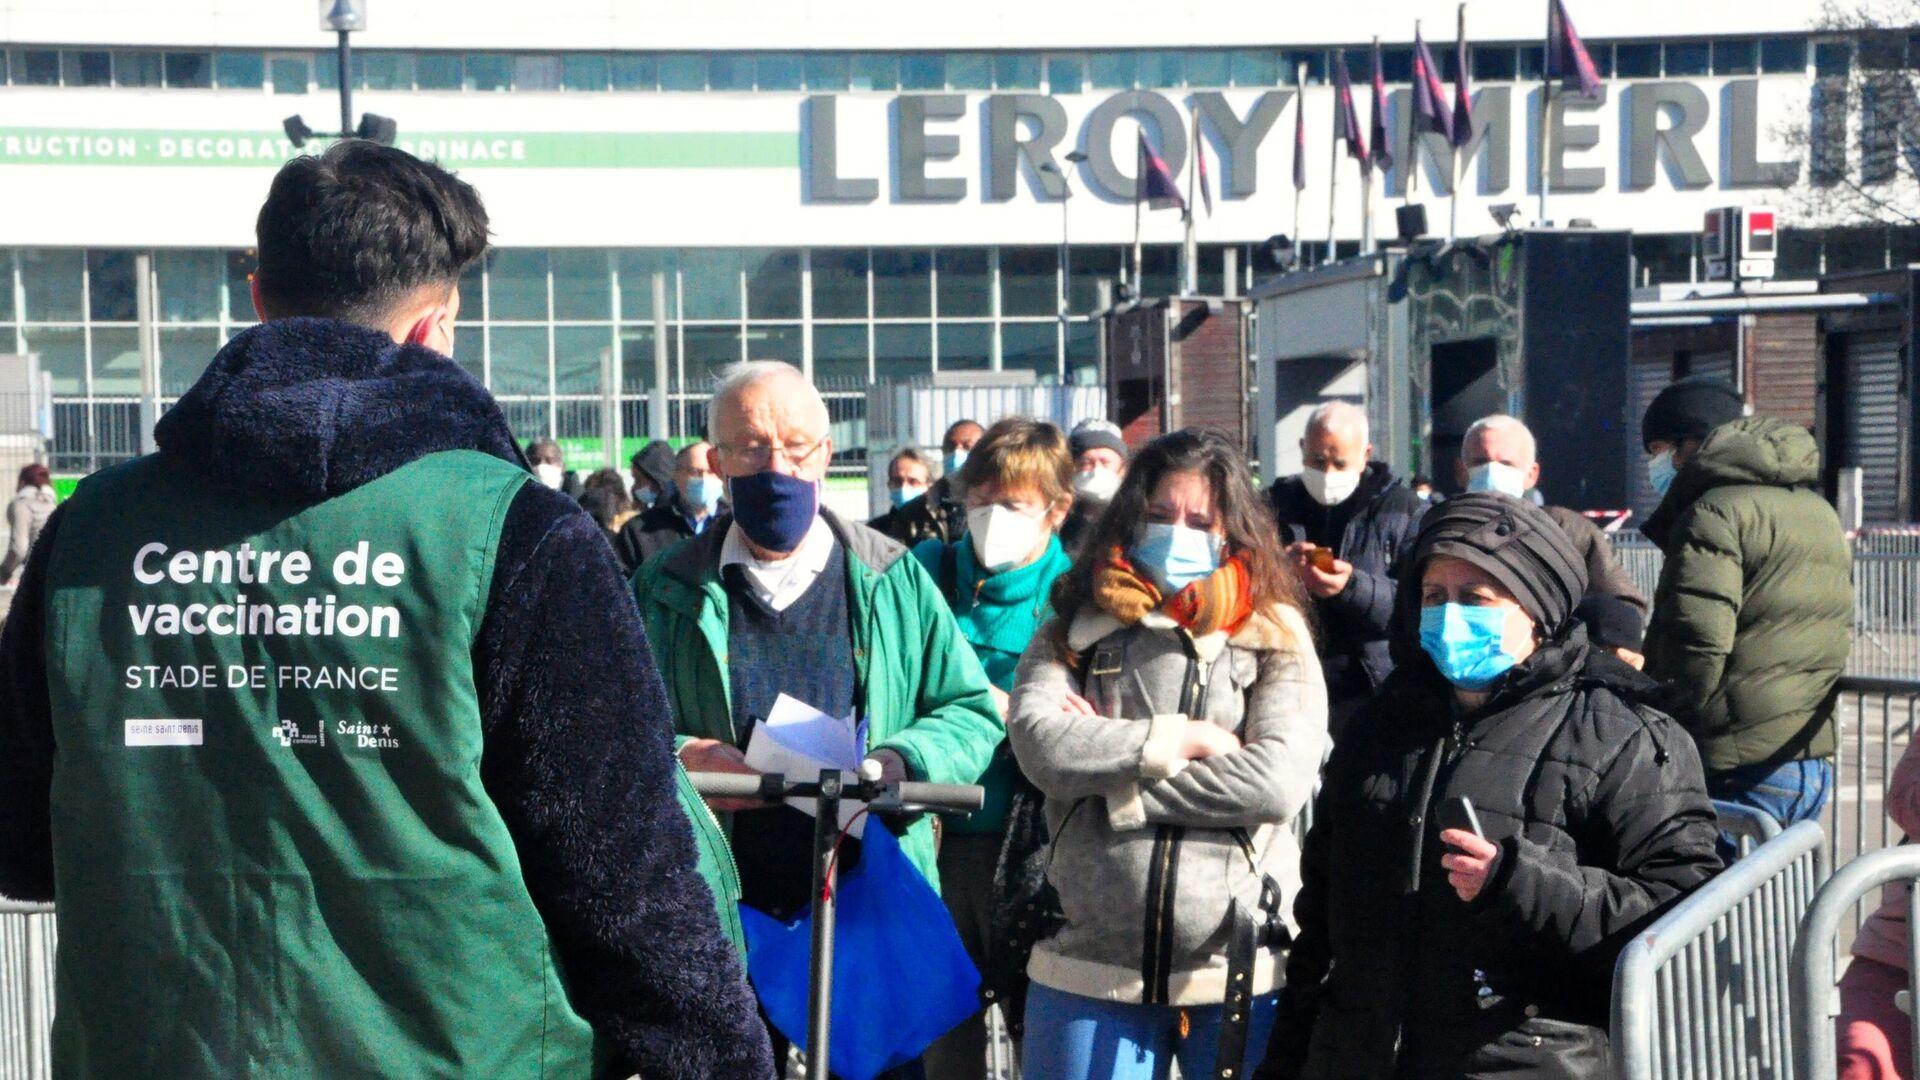 Местные жители стоят в очереди на вакцинацию от коронавируса в центре вакцинодром на стадионе Стад де Франс - РИА Новости, 1920, 08.05.2021